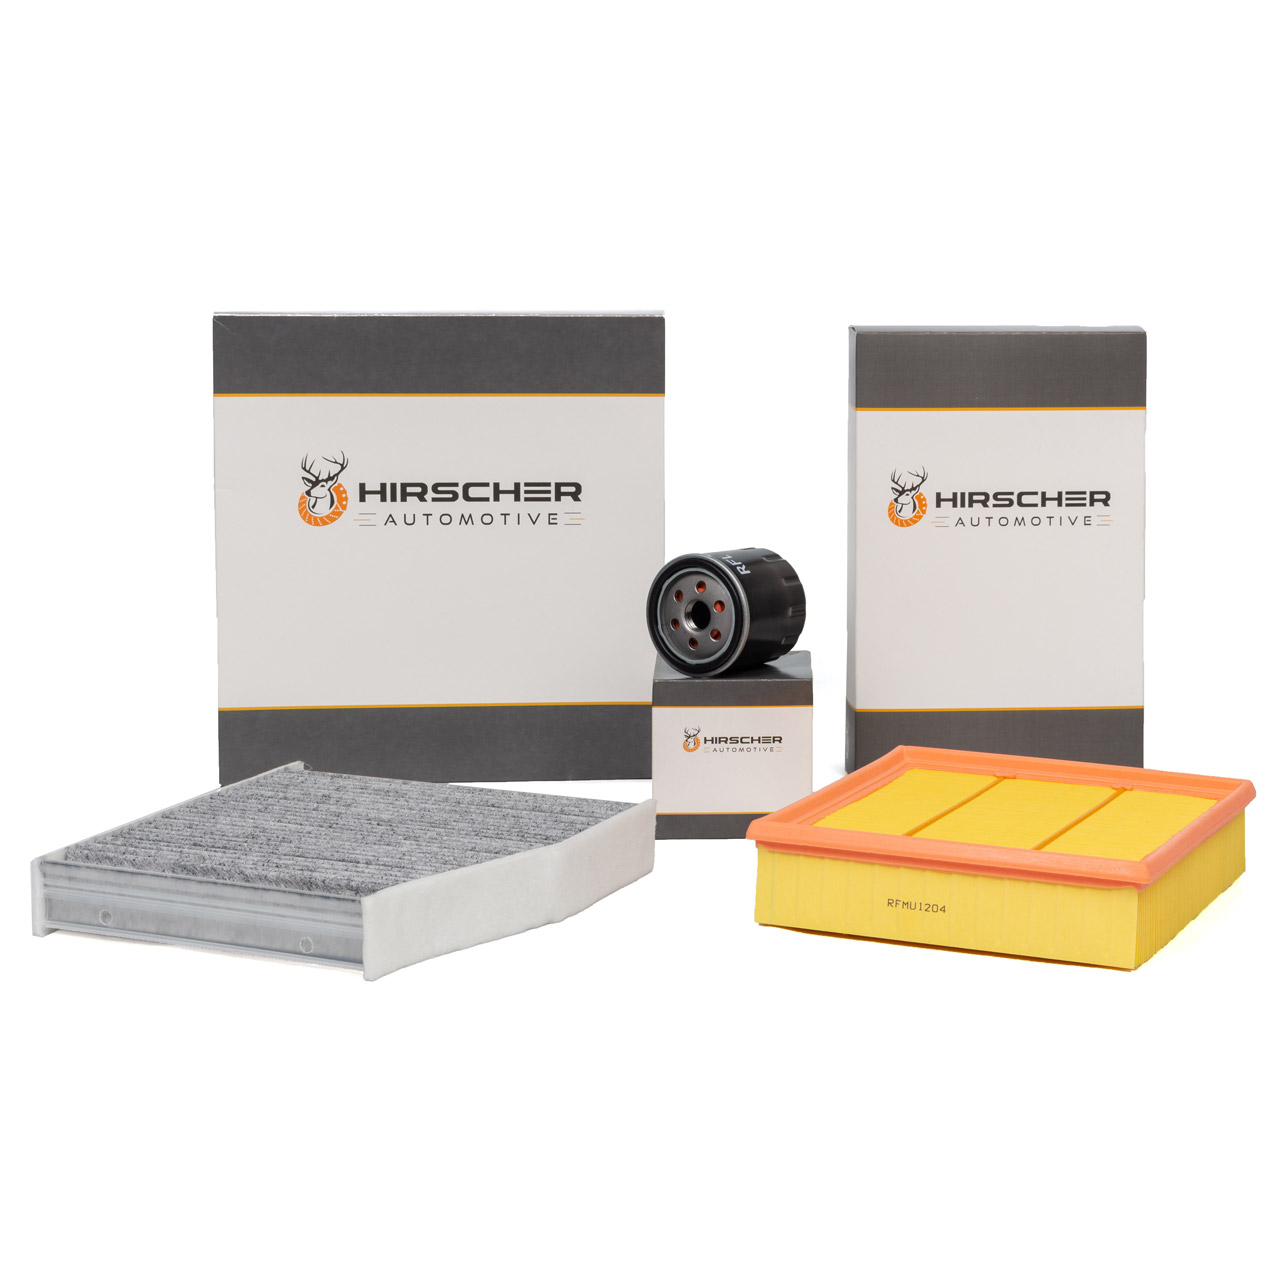 HIRSCHER Filterset MERCEDES W176 W246 C/X117 X156 160/180CDI 90/109 PS OM607